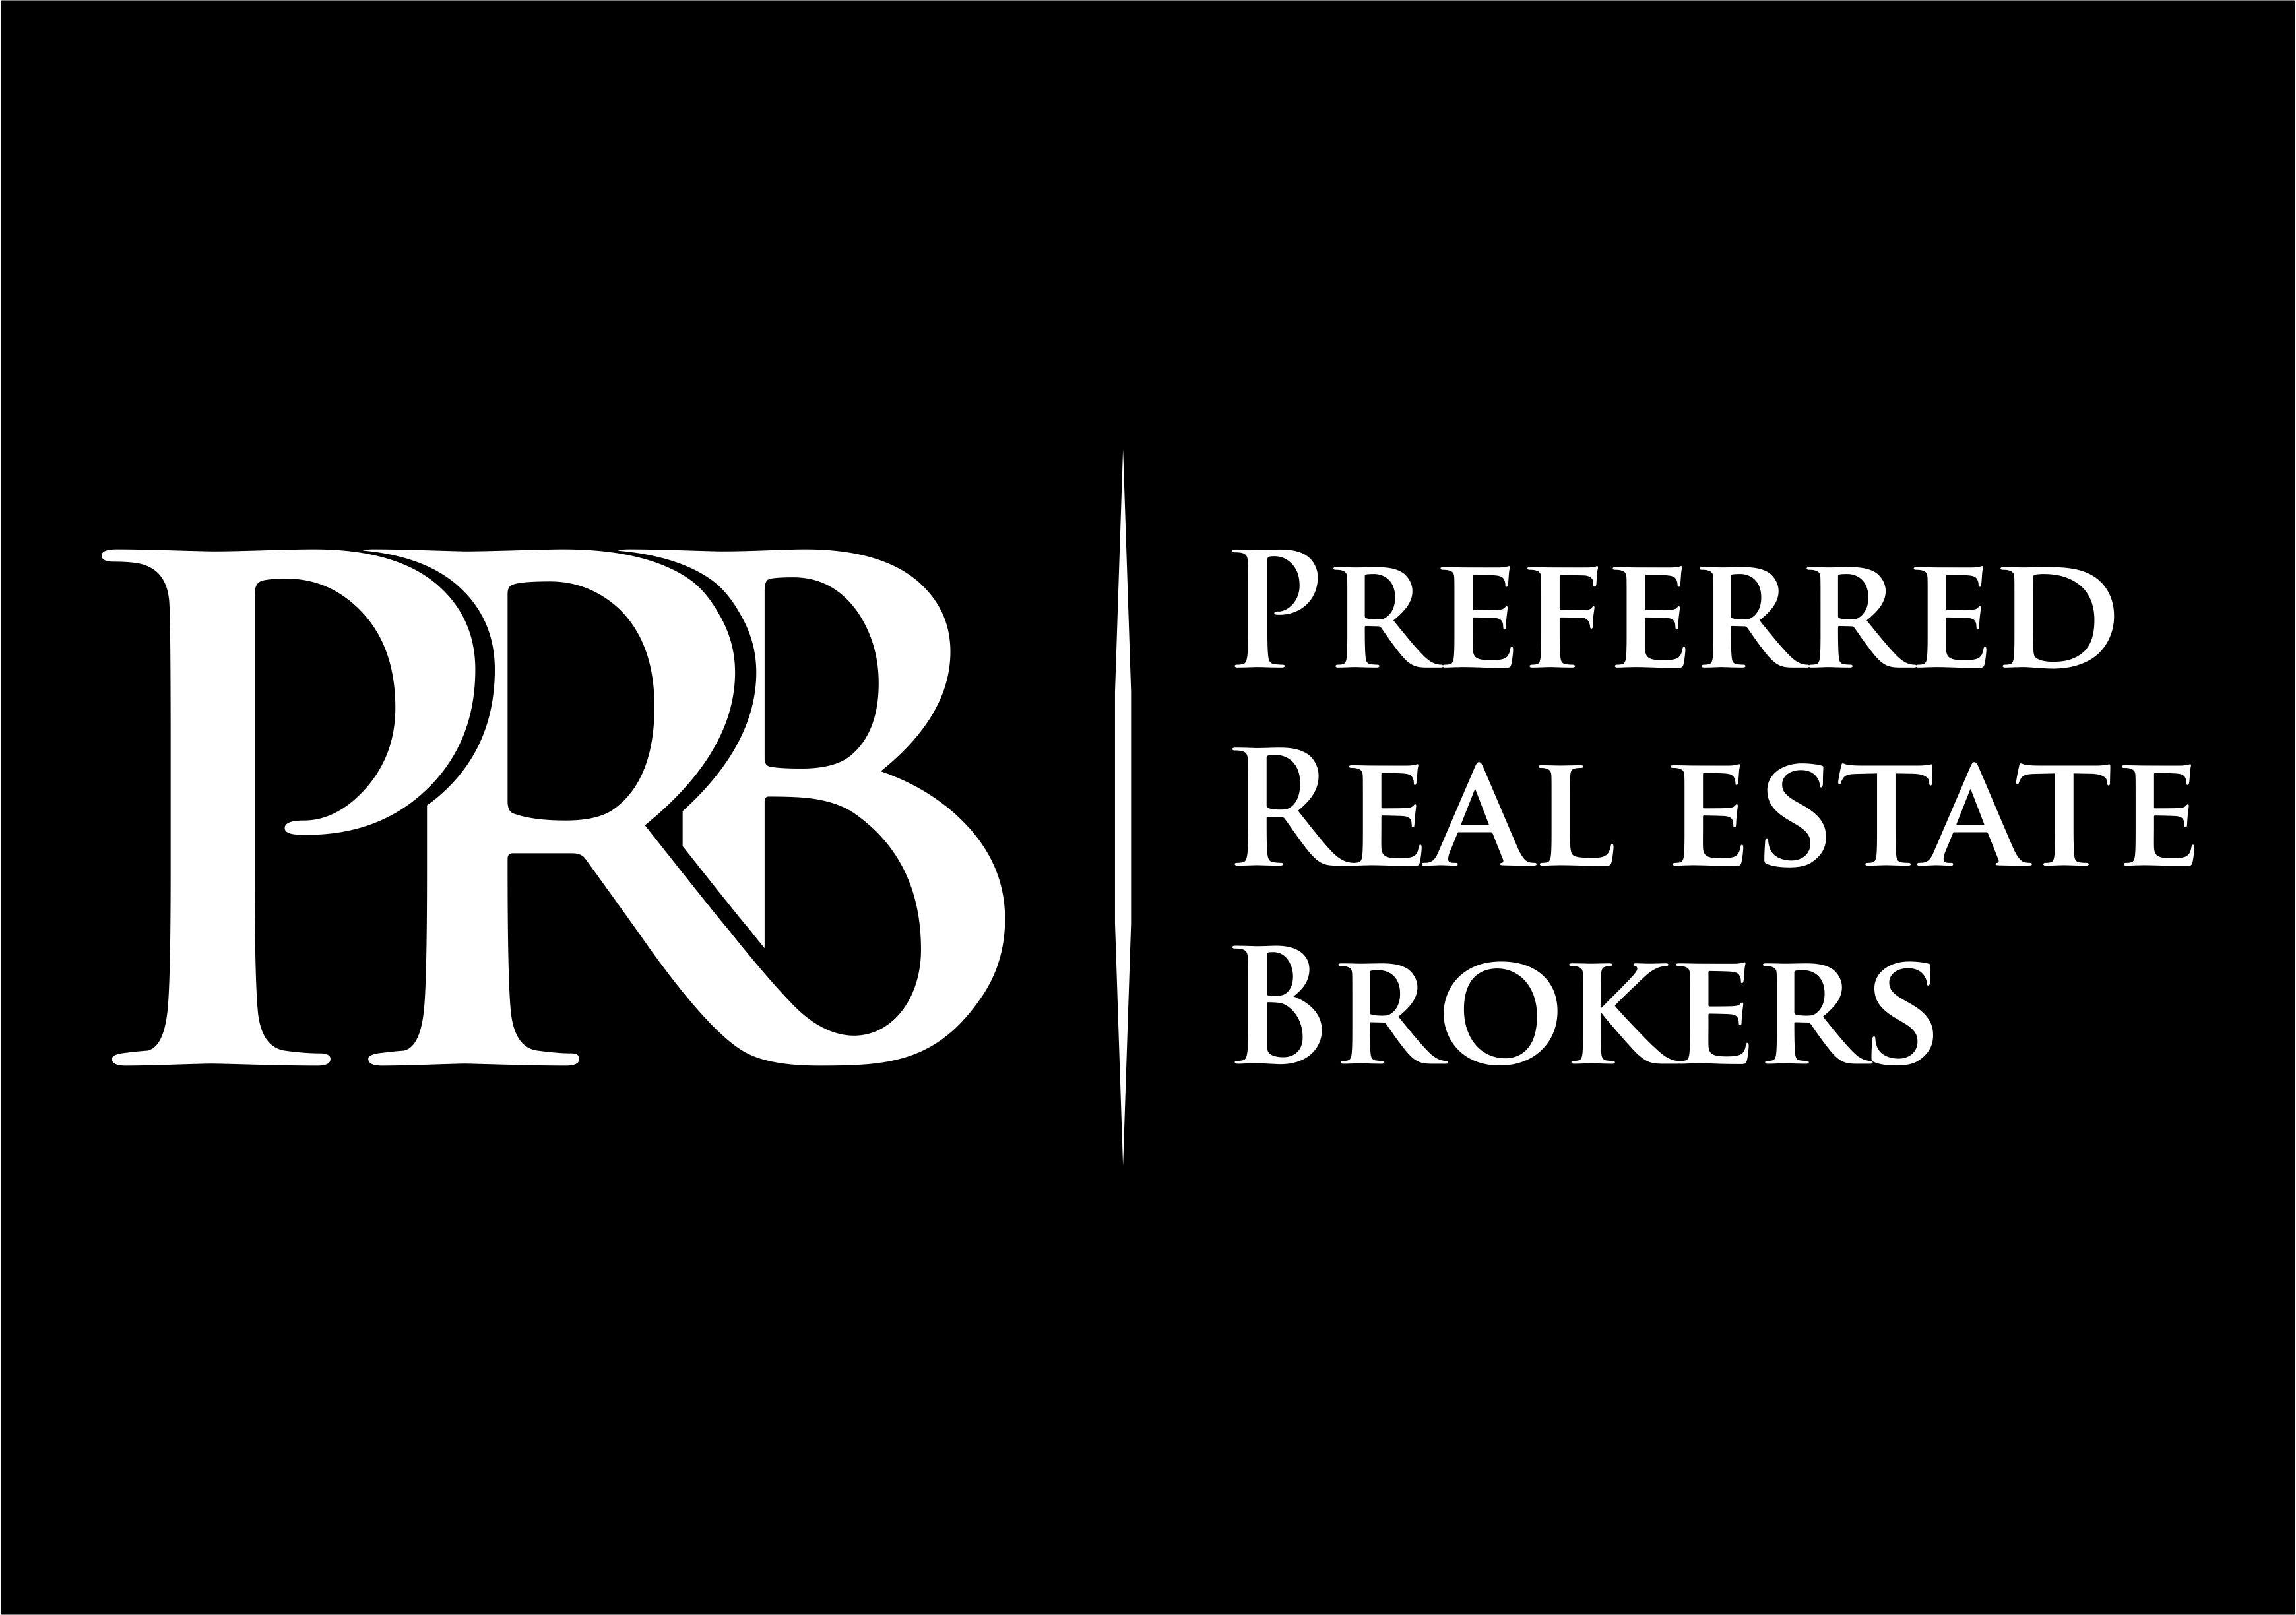 Preferred Real Estate Brokers logo